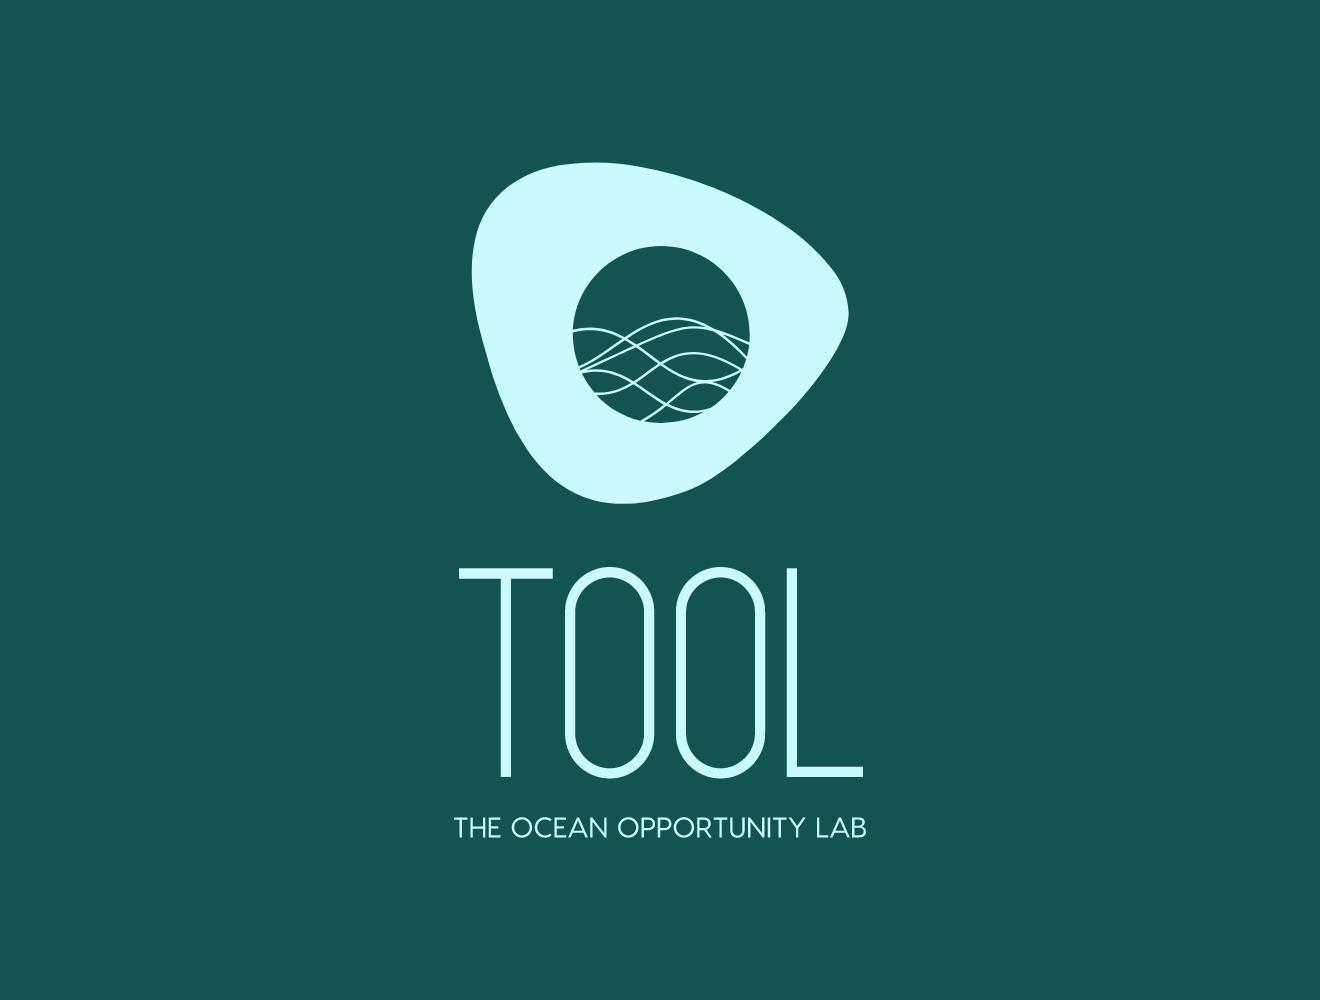 TOOL's logo.